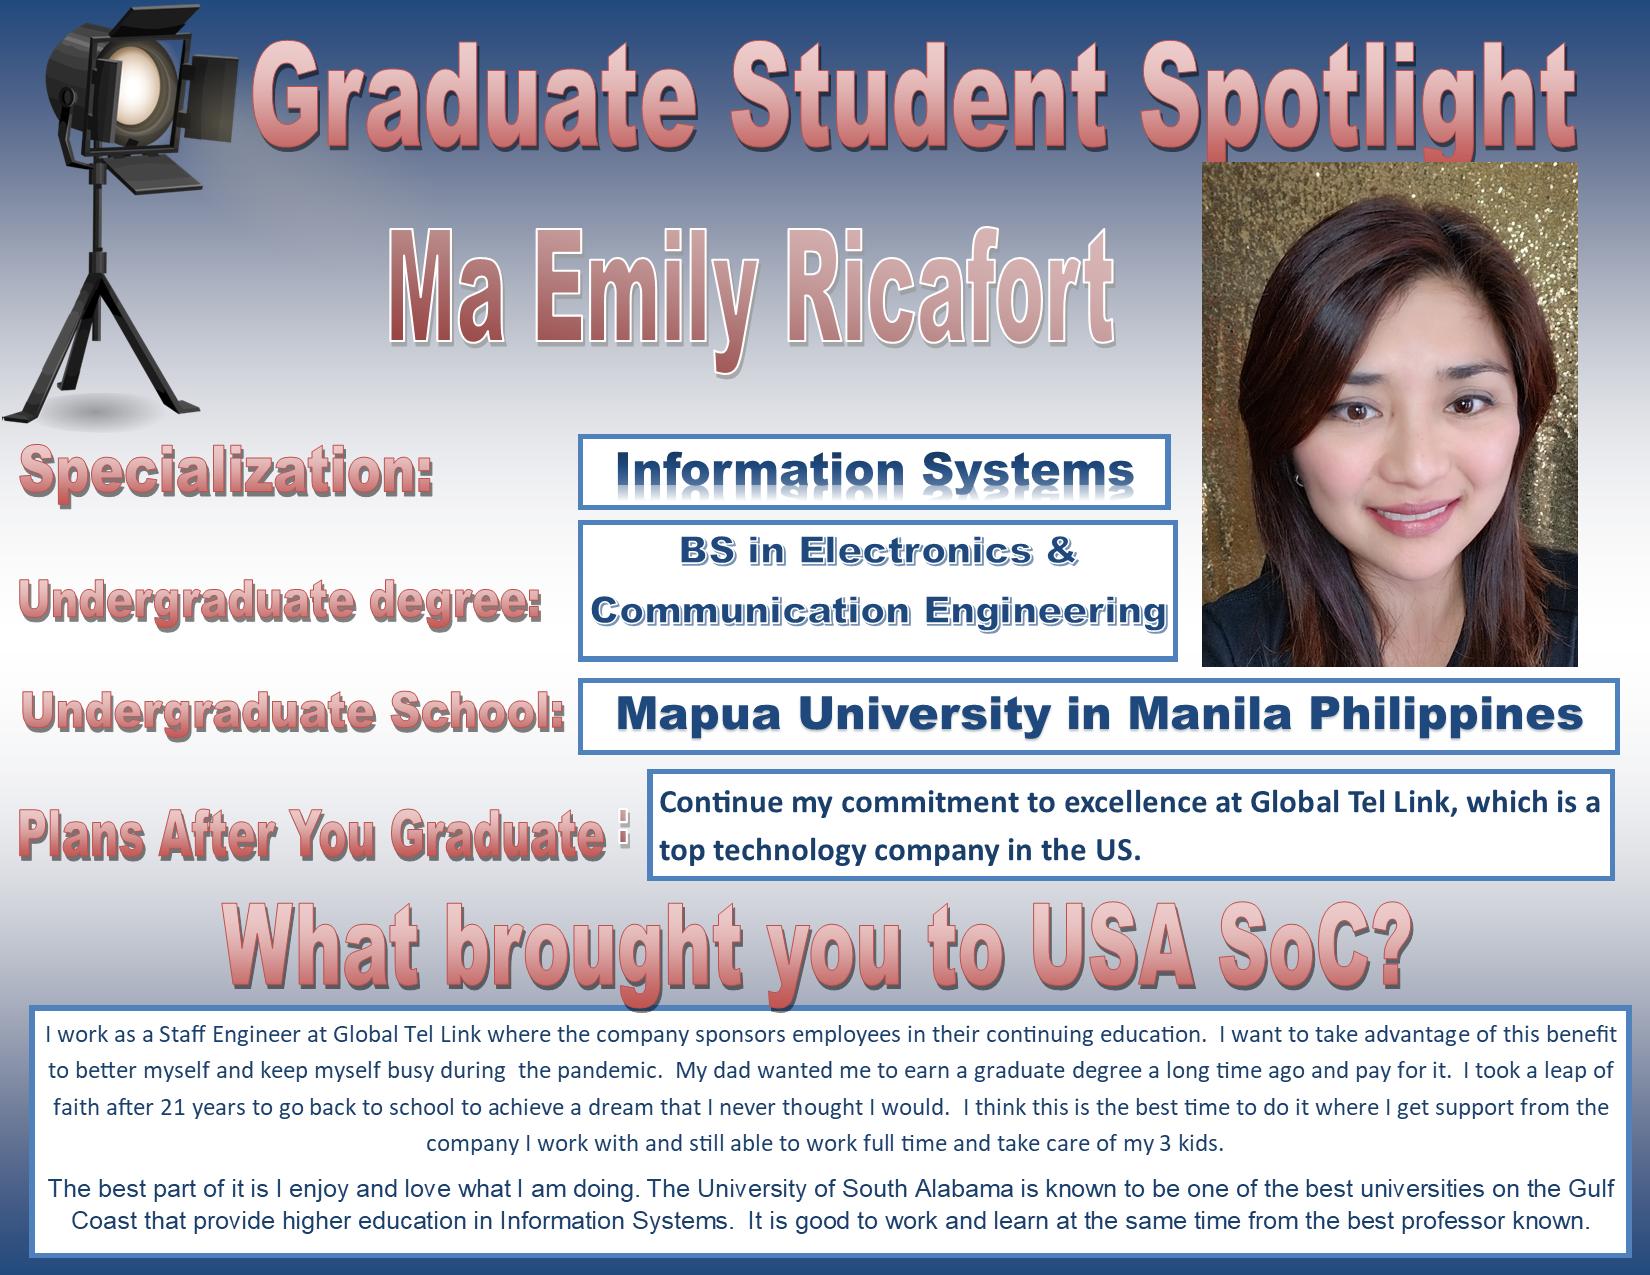 Graduate Student Spotlight - Emily Ricafort